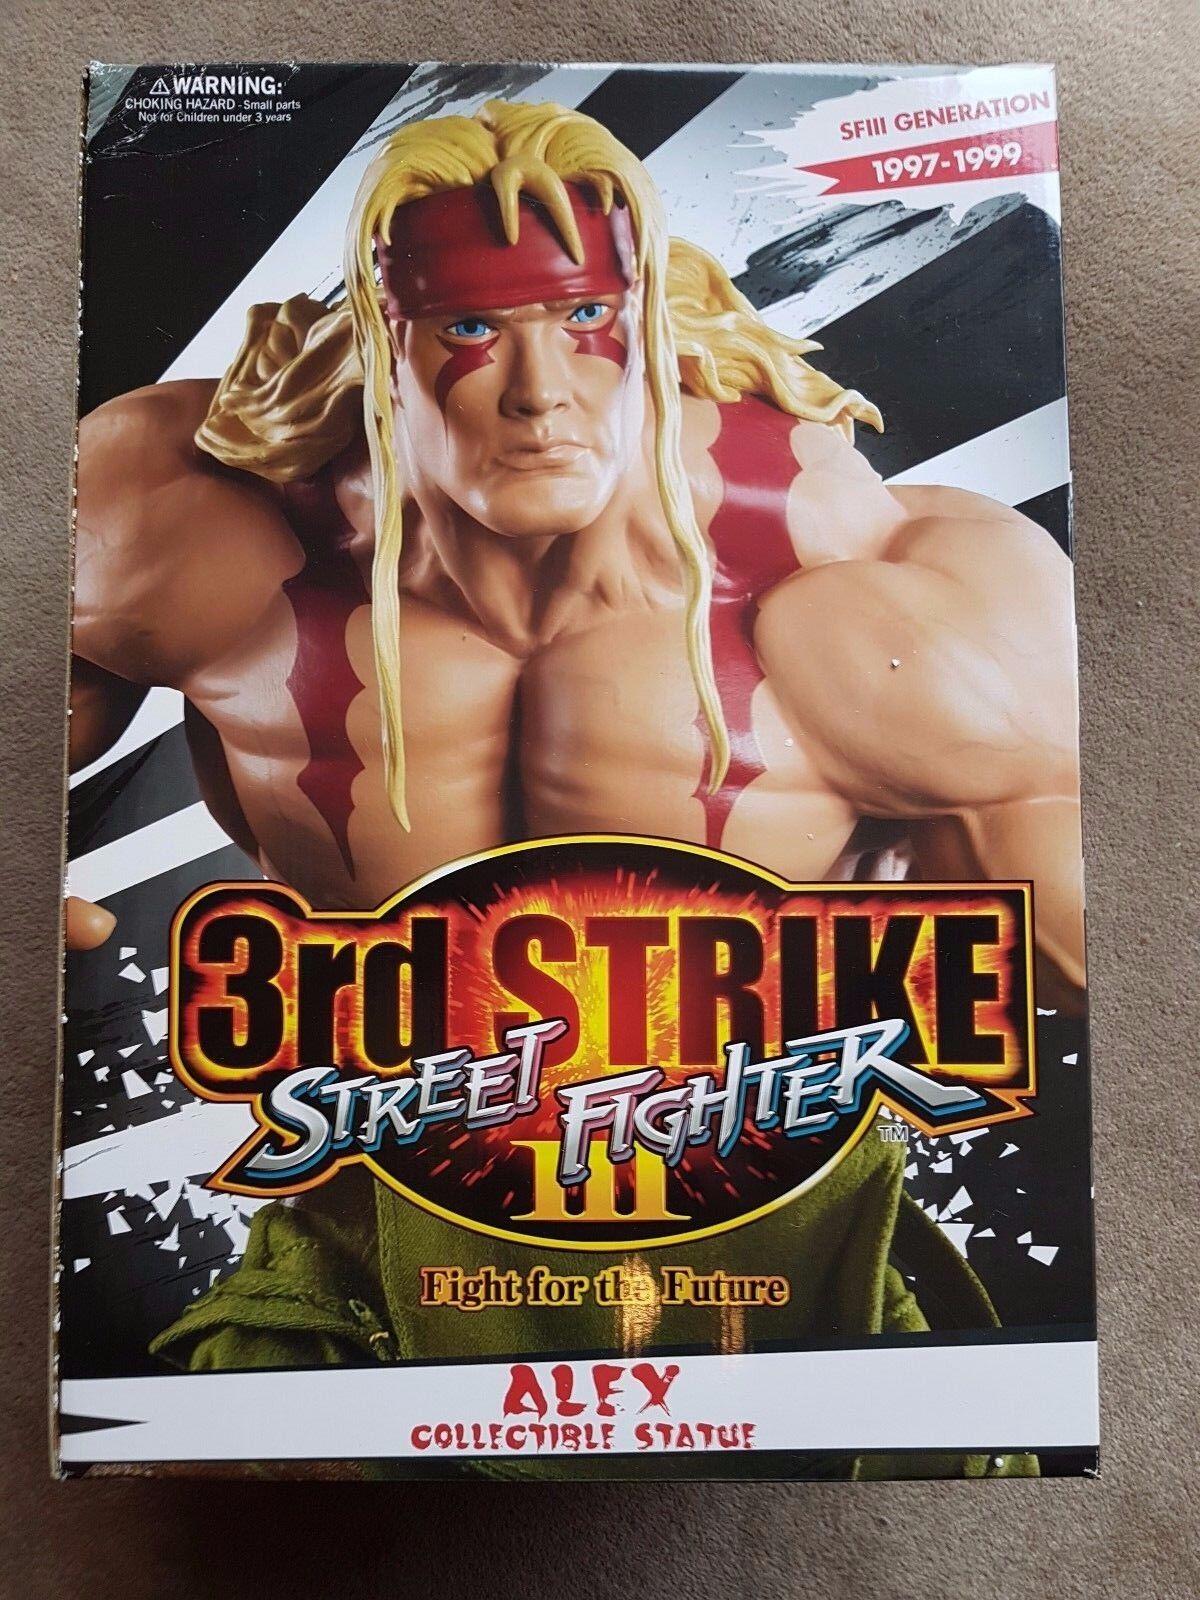 PCS POP CULTURE SHOCK 1 4 ALEX - STREET STREET STREET FIGHTER - STATUE 2a2fe4